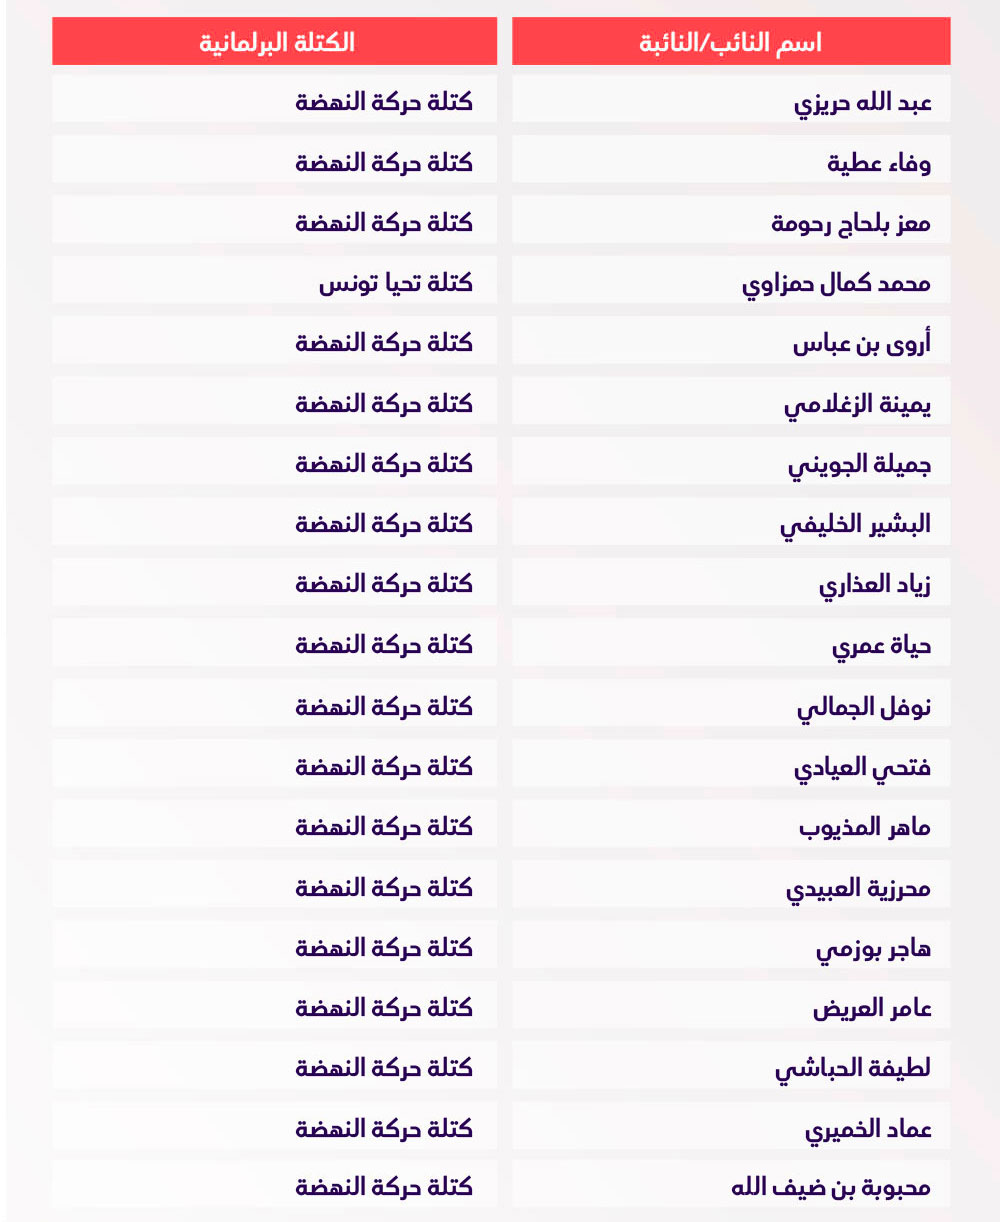 vote-bawsala-300720--11.jpg